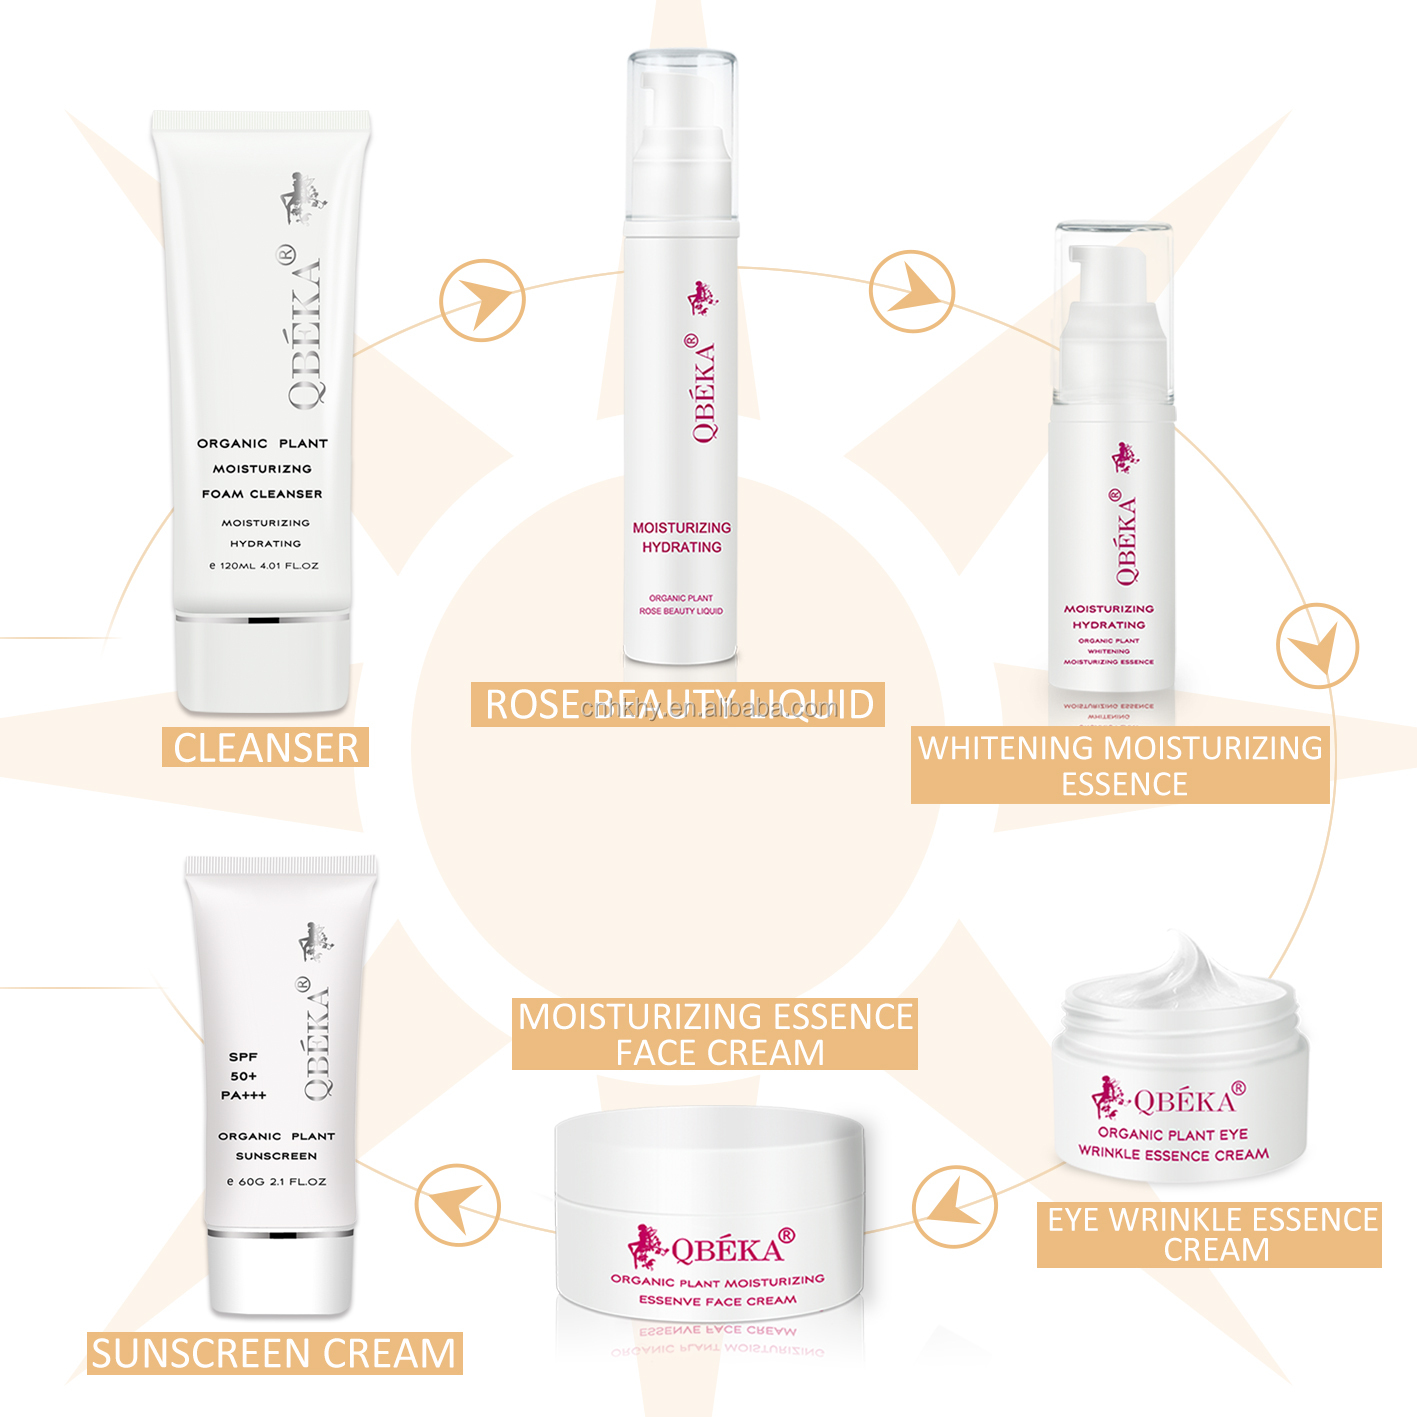 Anti Wrinkle Eye Cream Best Anti Wrinkle Eye Cream For Sensitive Skin Reviews Buy Korean Anti Aging Eye Cream Best Anti Aging Eye Cream Nz Anti Wrinkle Eye Cream For 30s Product On